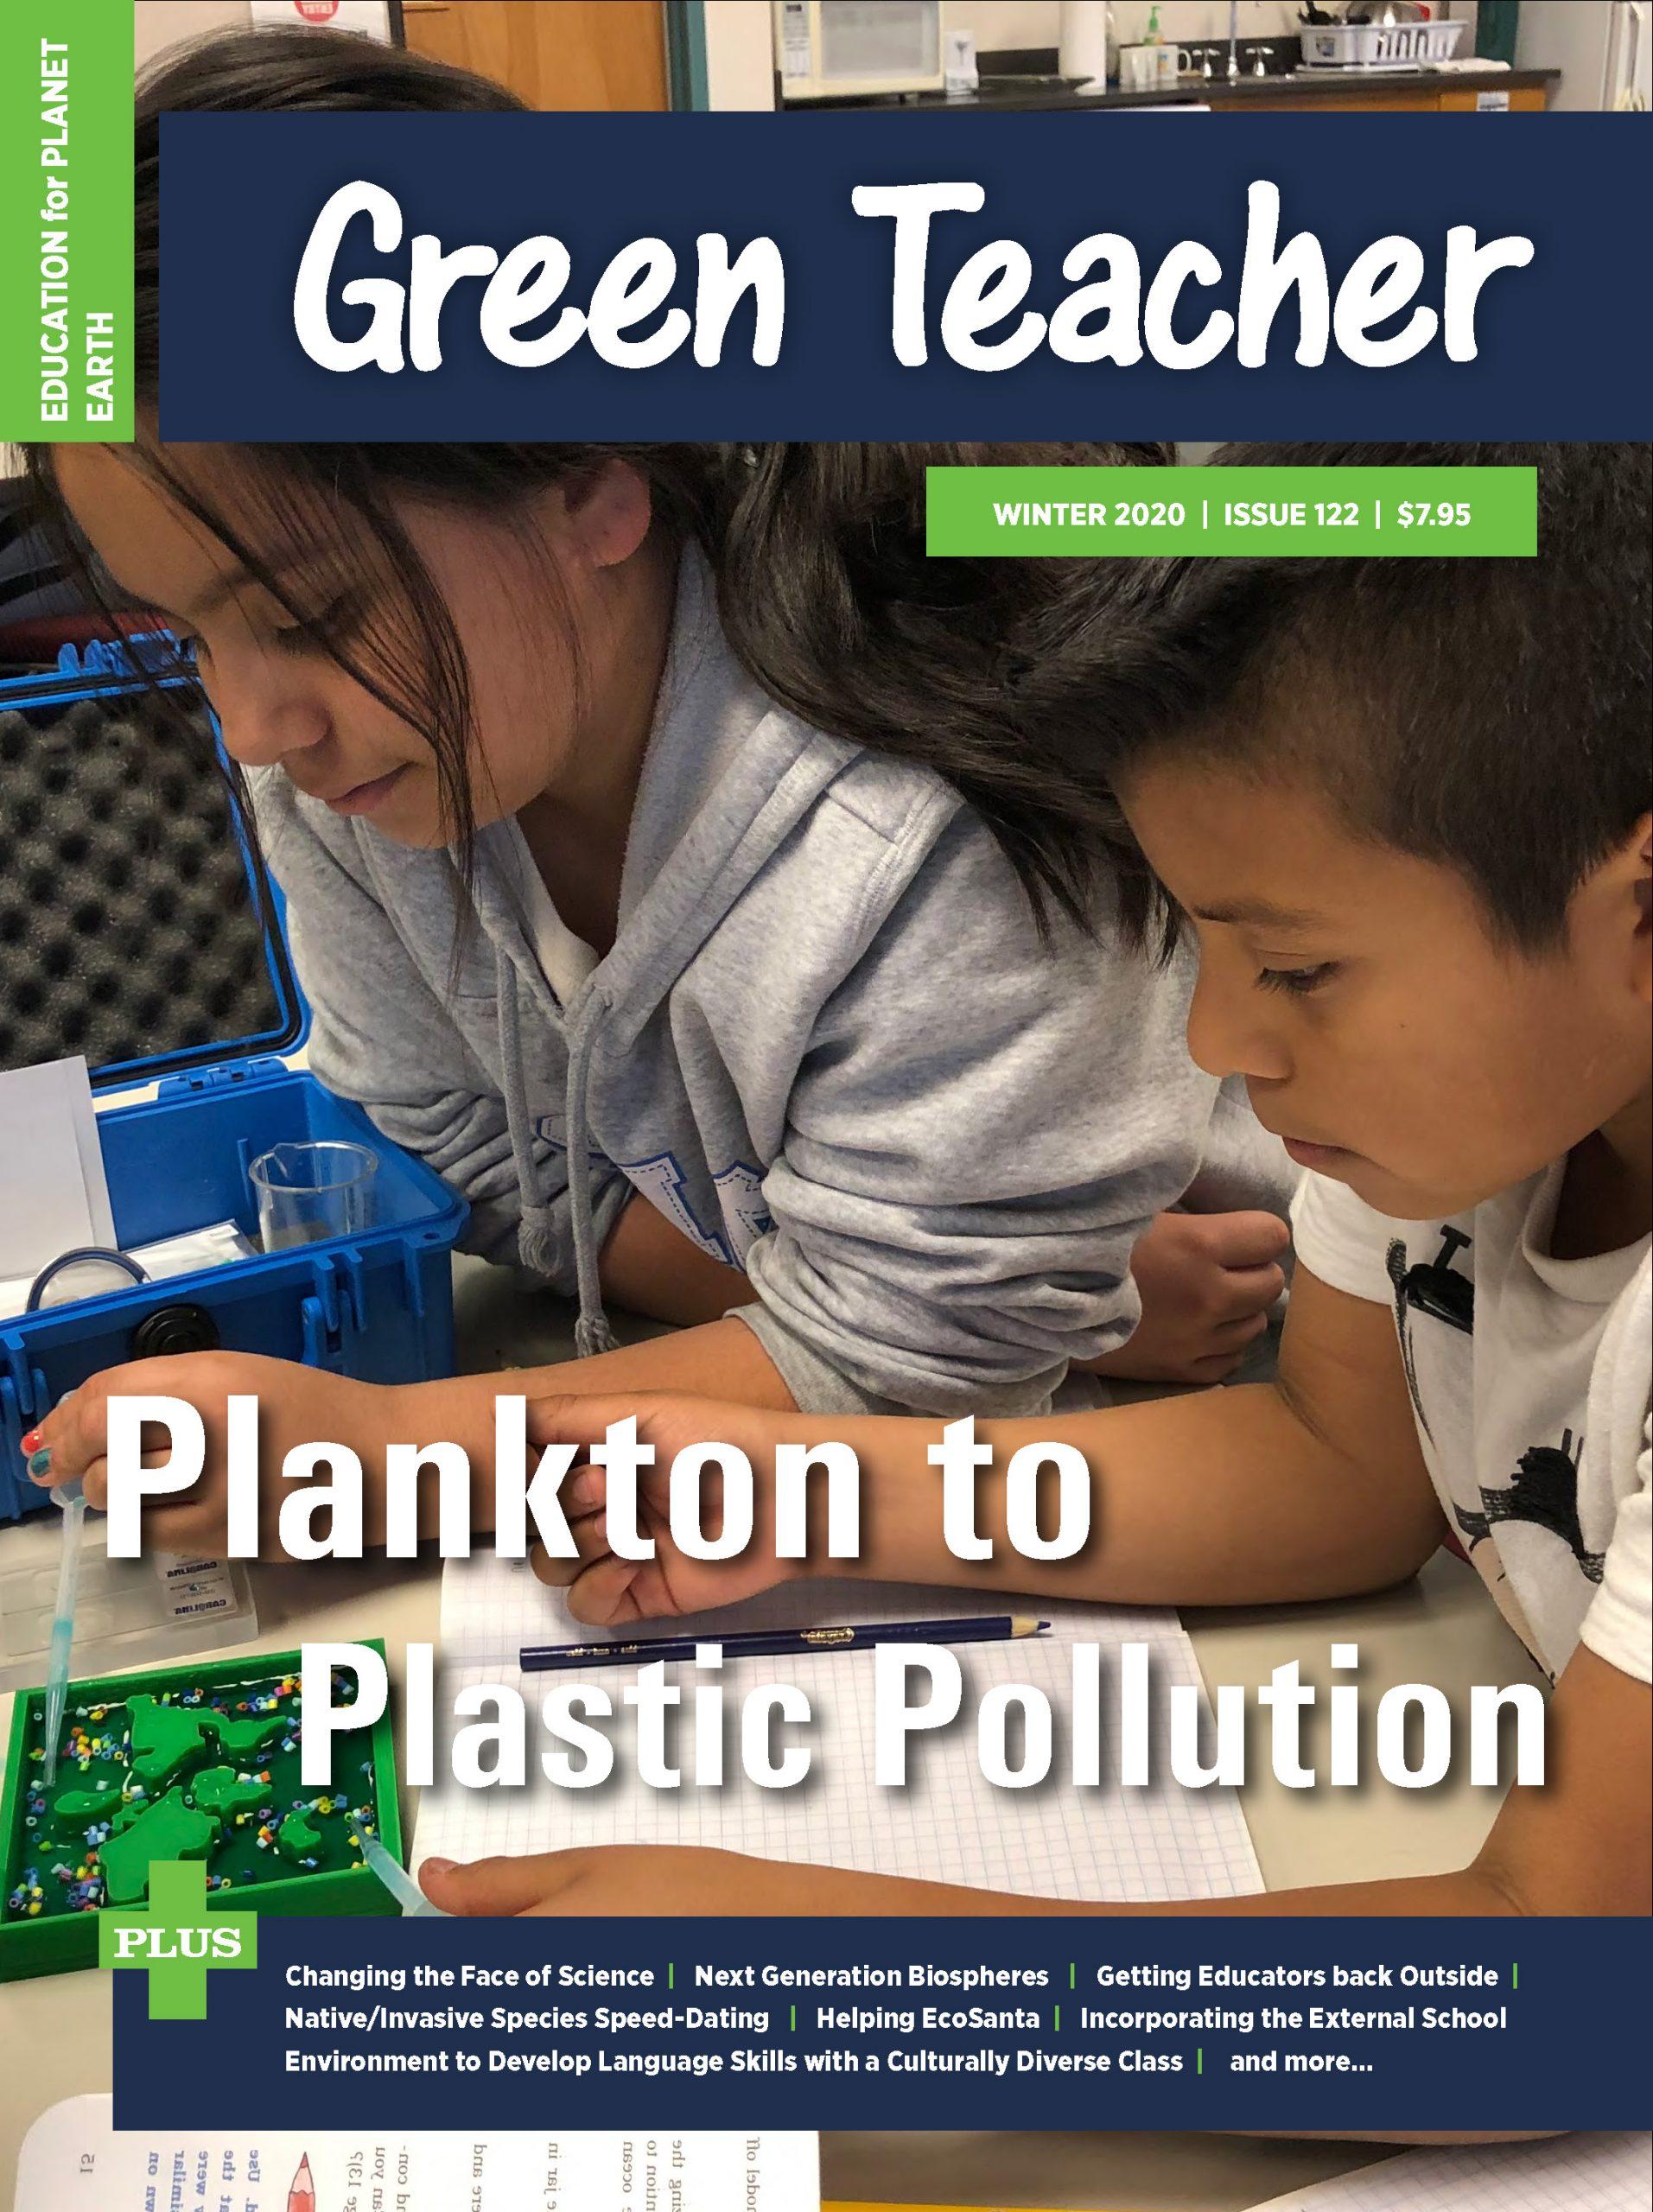 Green Teacher 122 — Winter 2020 - Green Teacher | Green Teacher